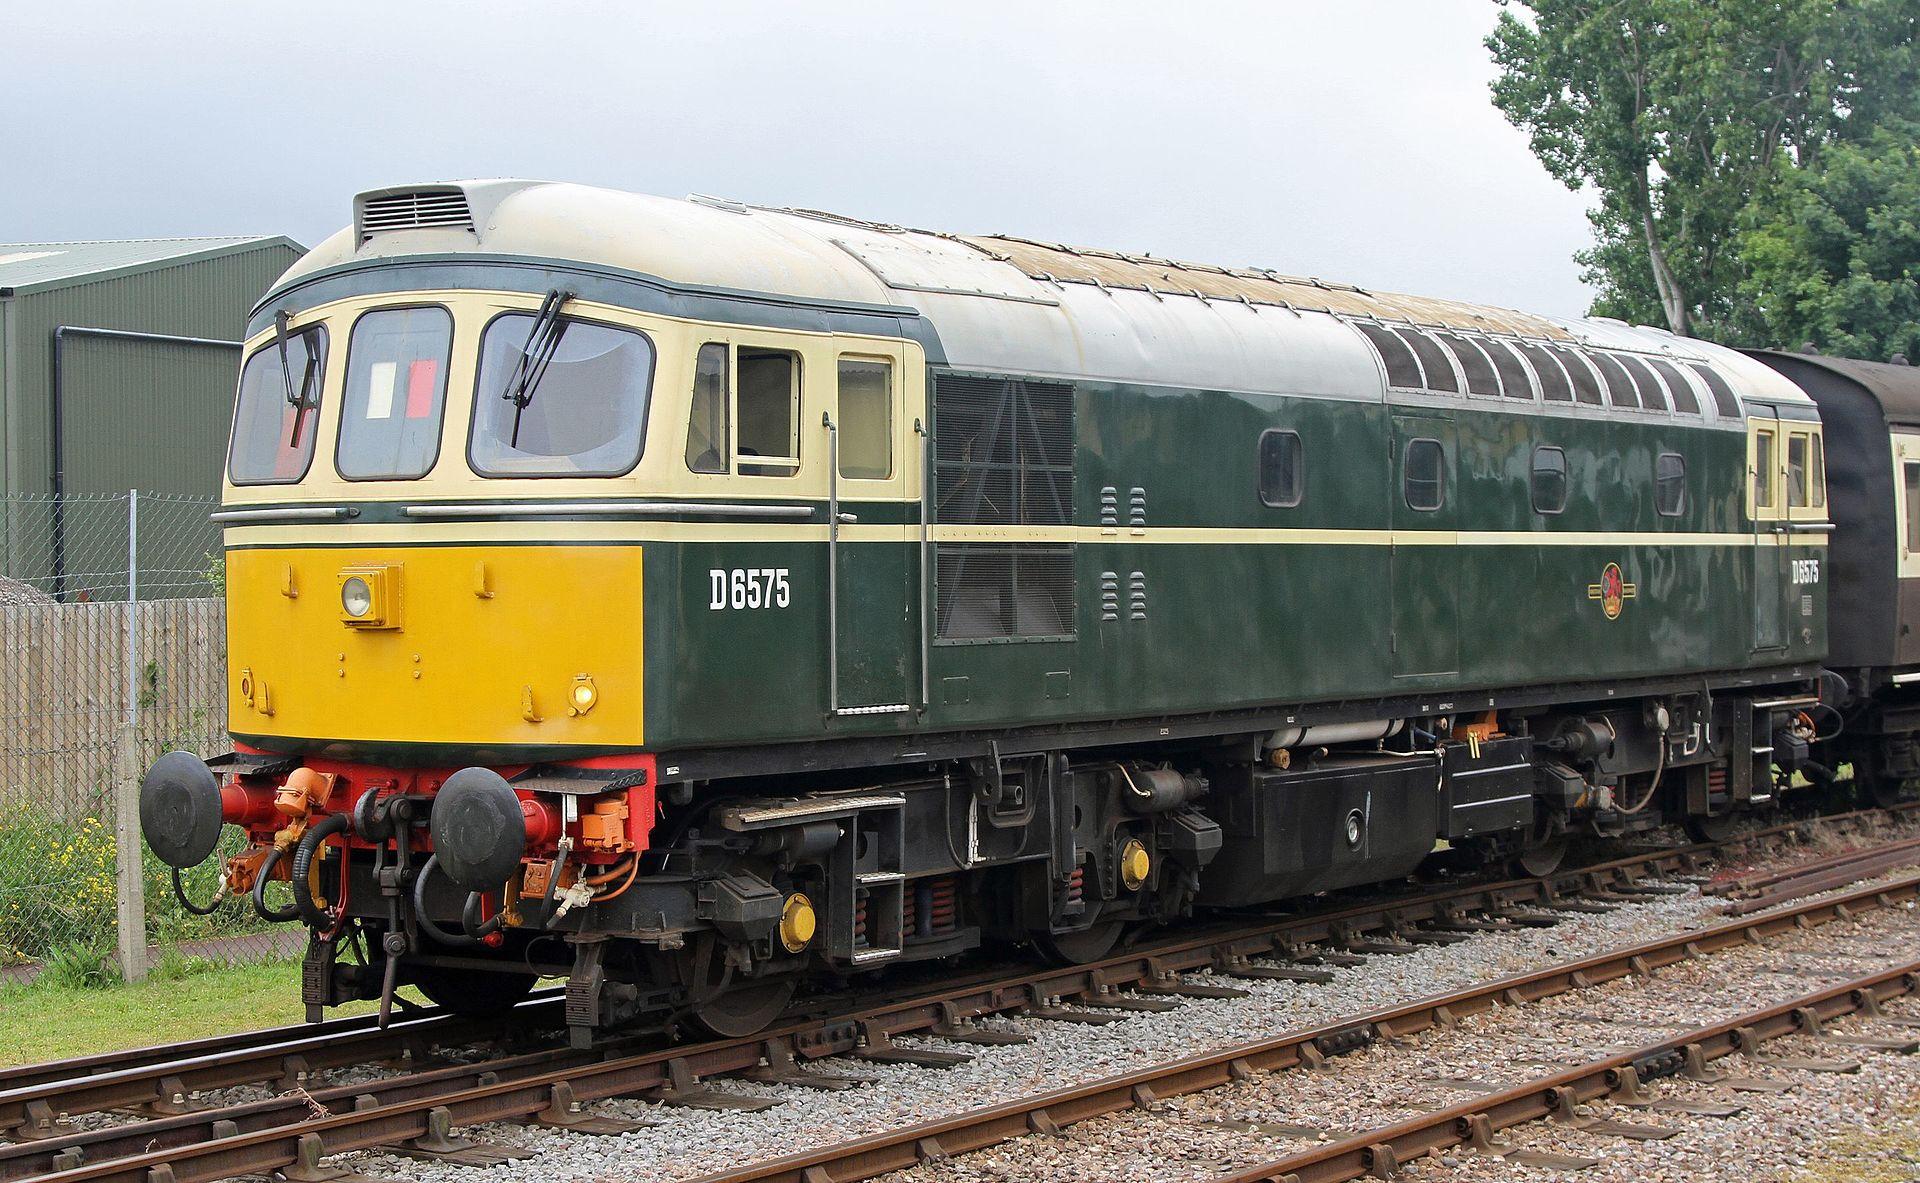 D6575 at MInehead in 2015